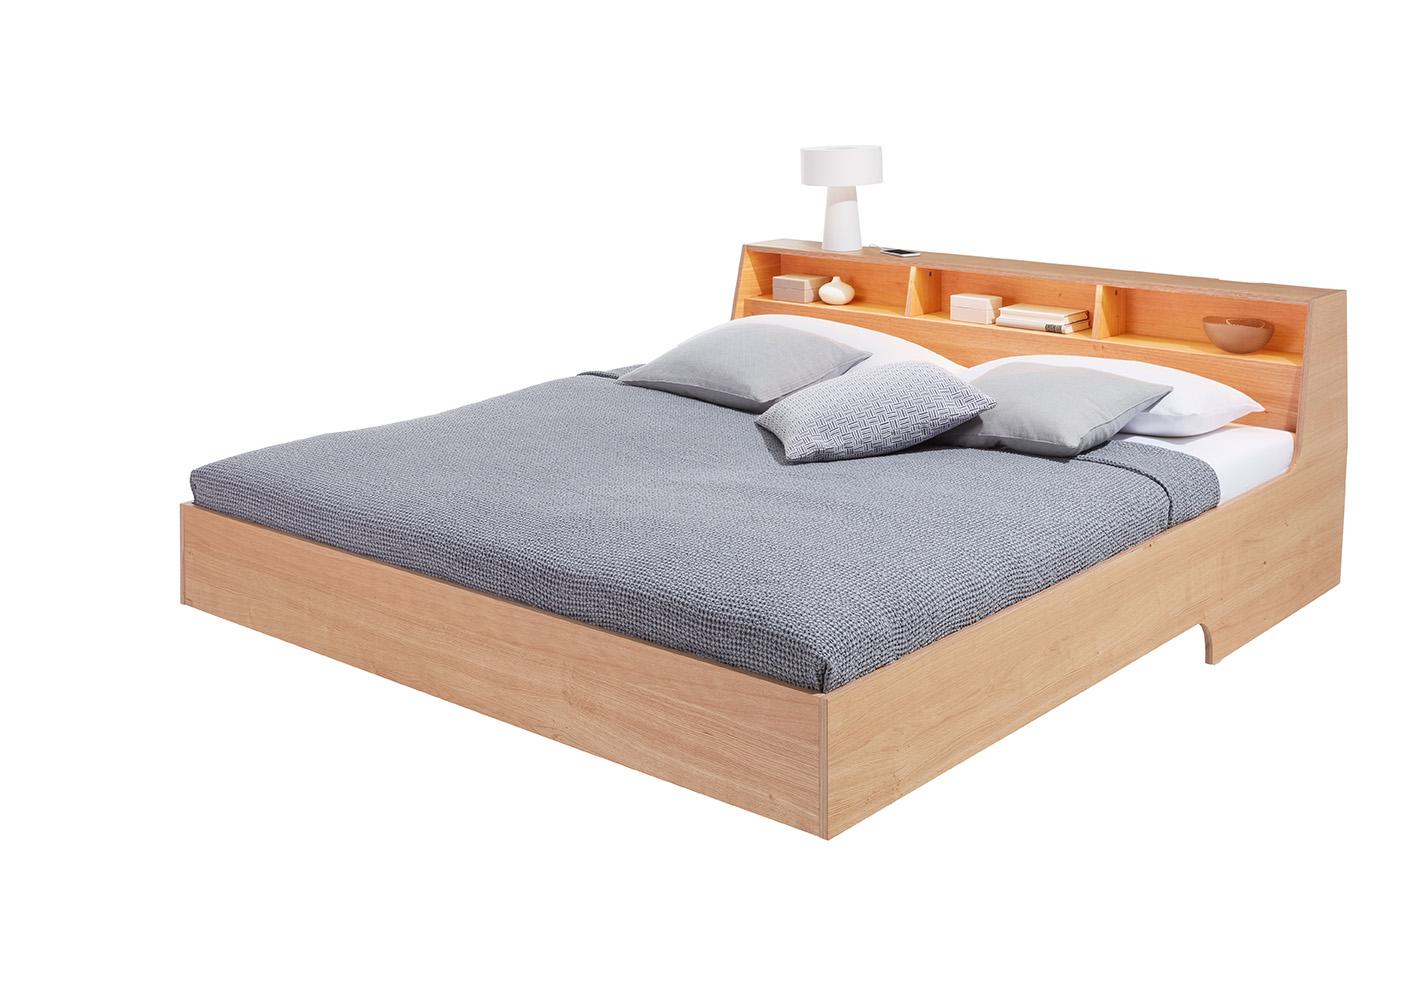 slope bett eiche. Black Bedroom Furniture Sets. Home Design Ideas